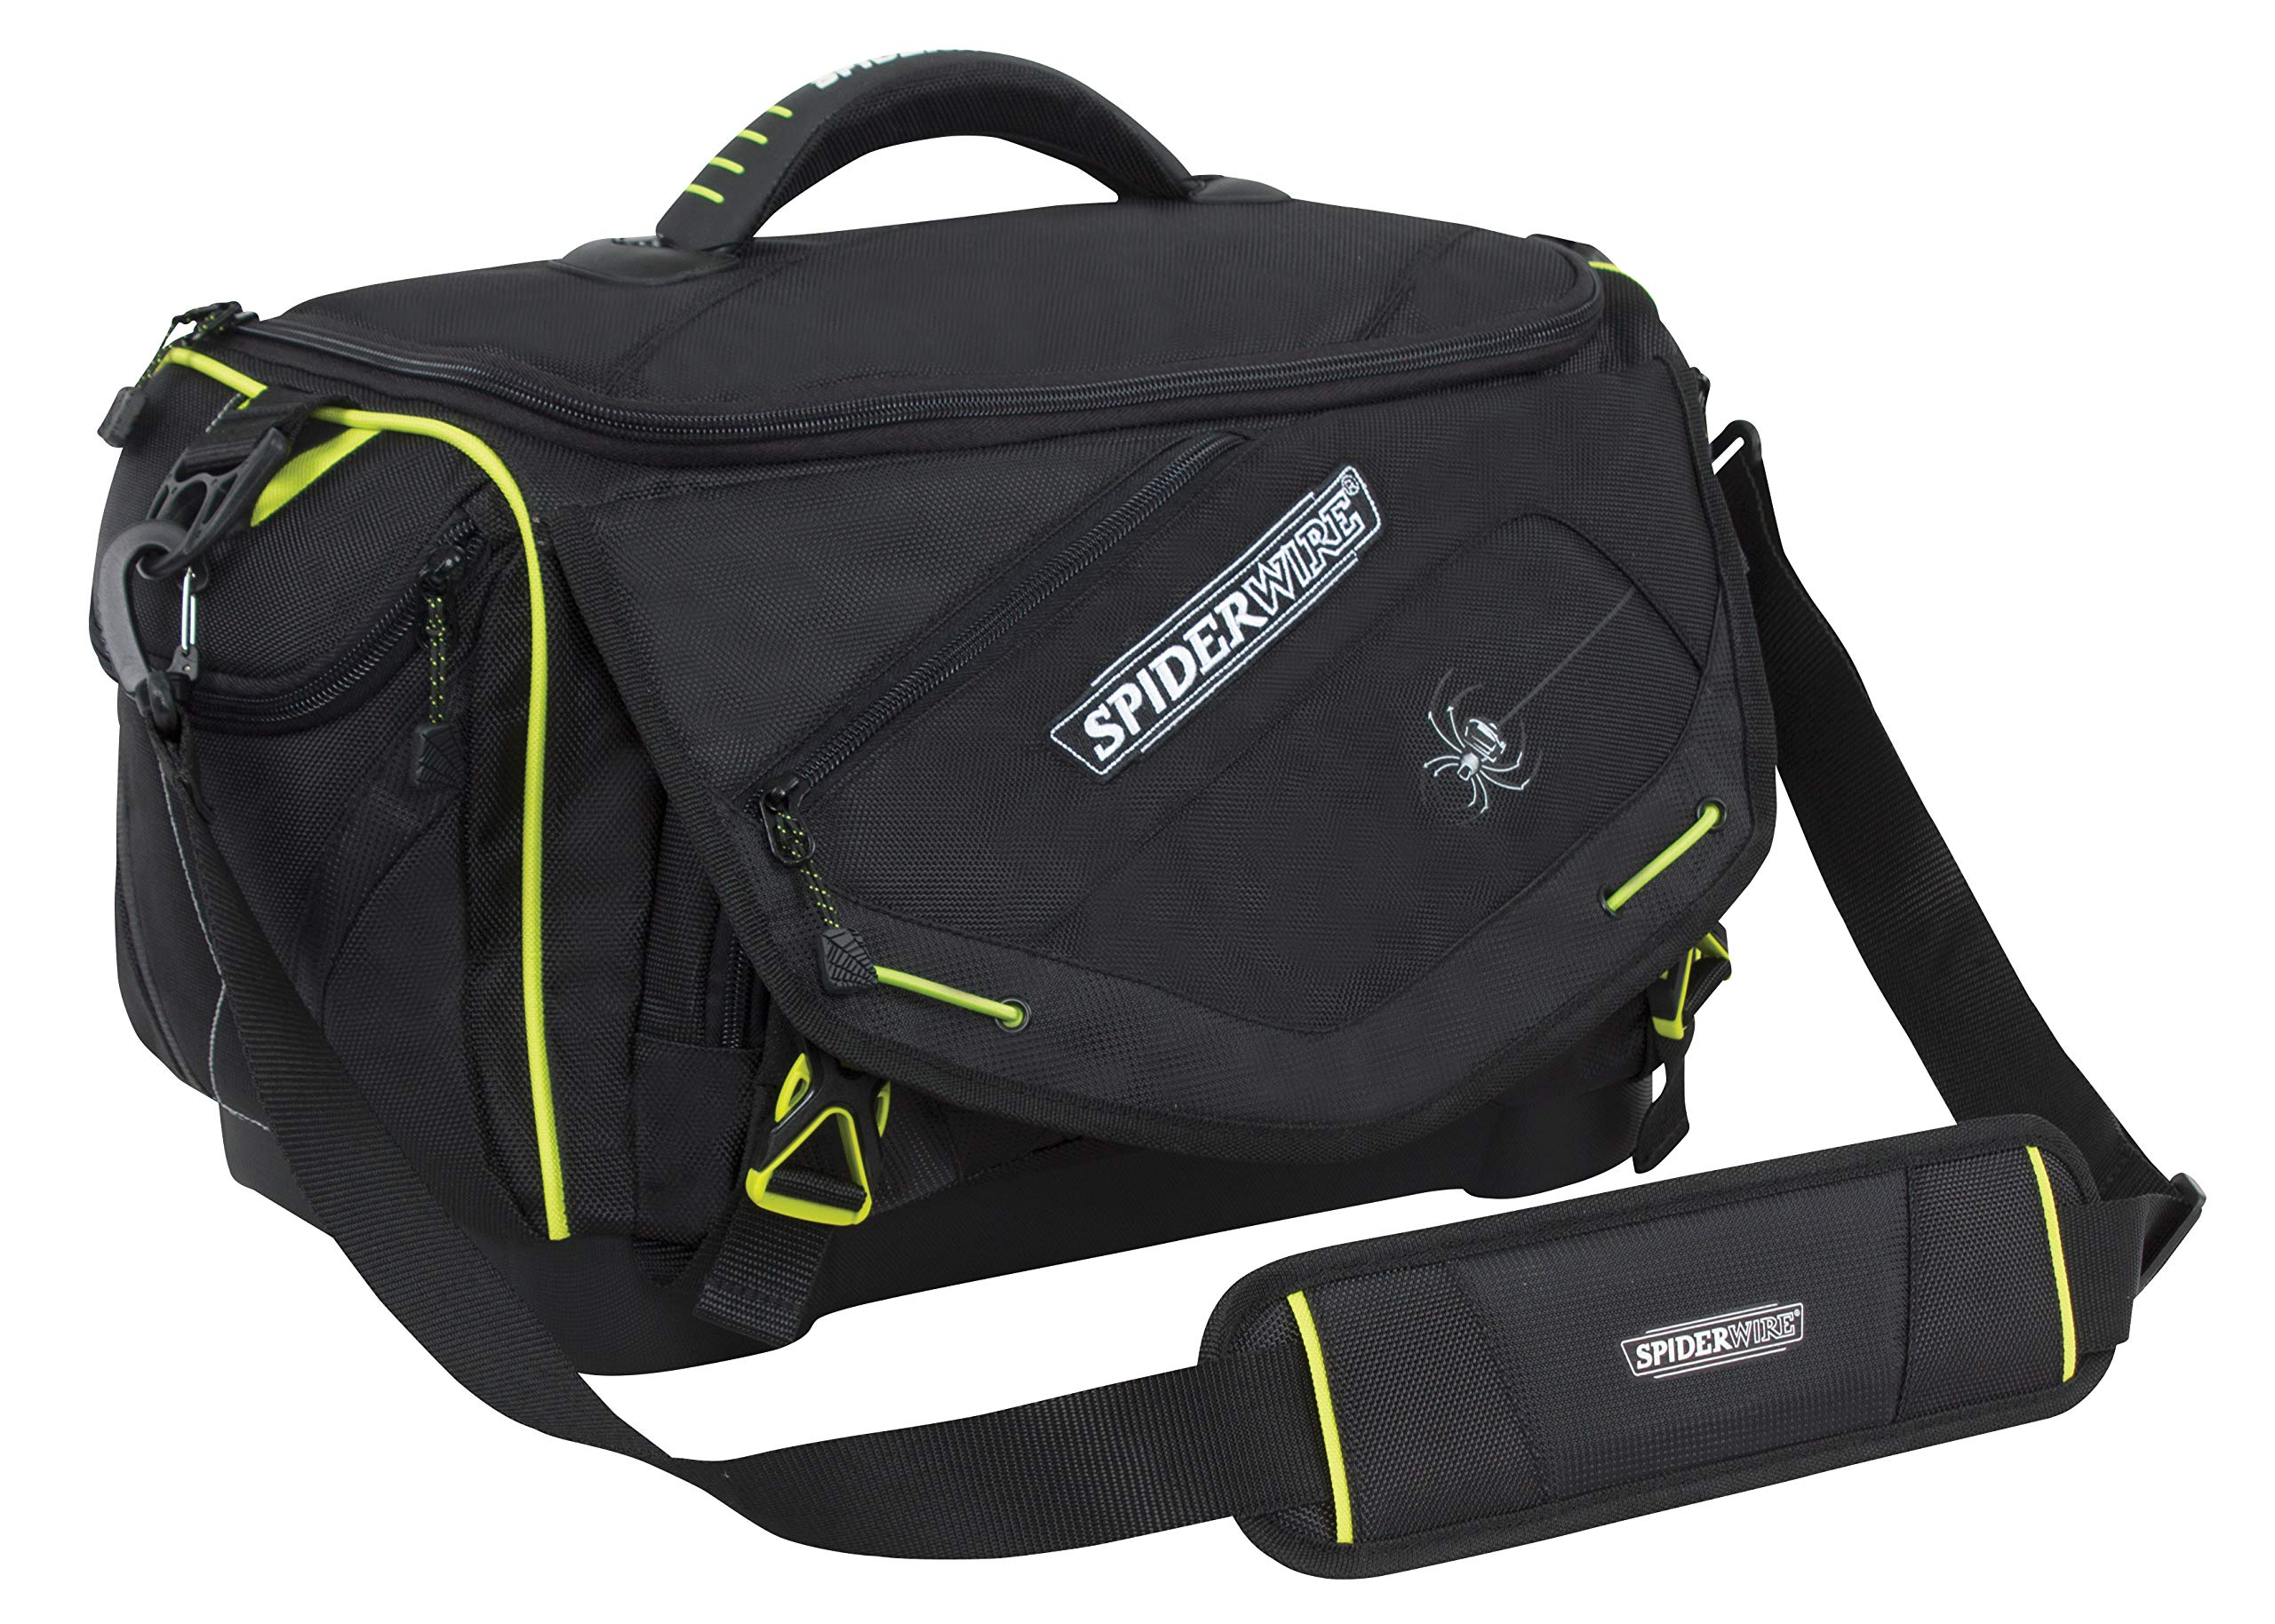 Spiderwire Wolf Tackle Bag, 27.6-Liter, Black